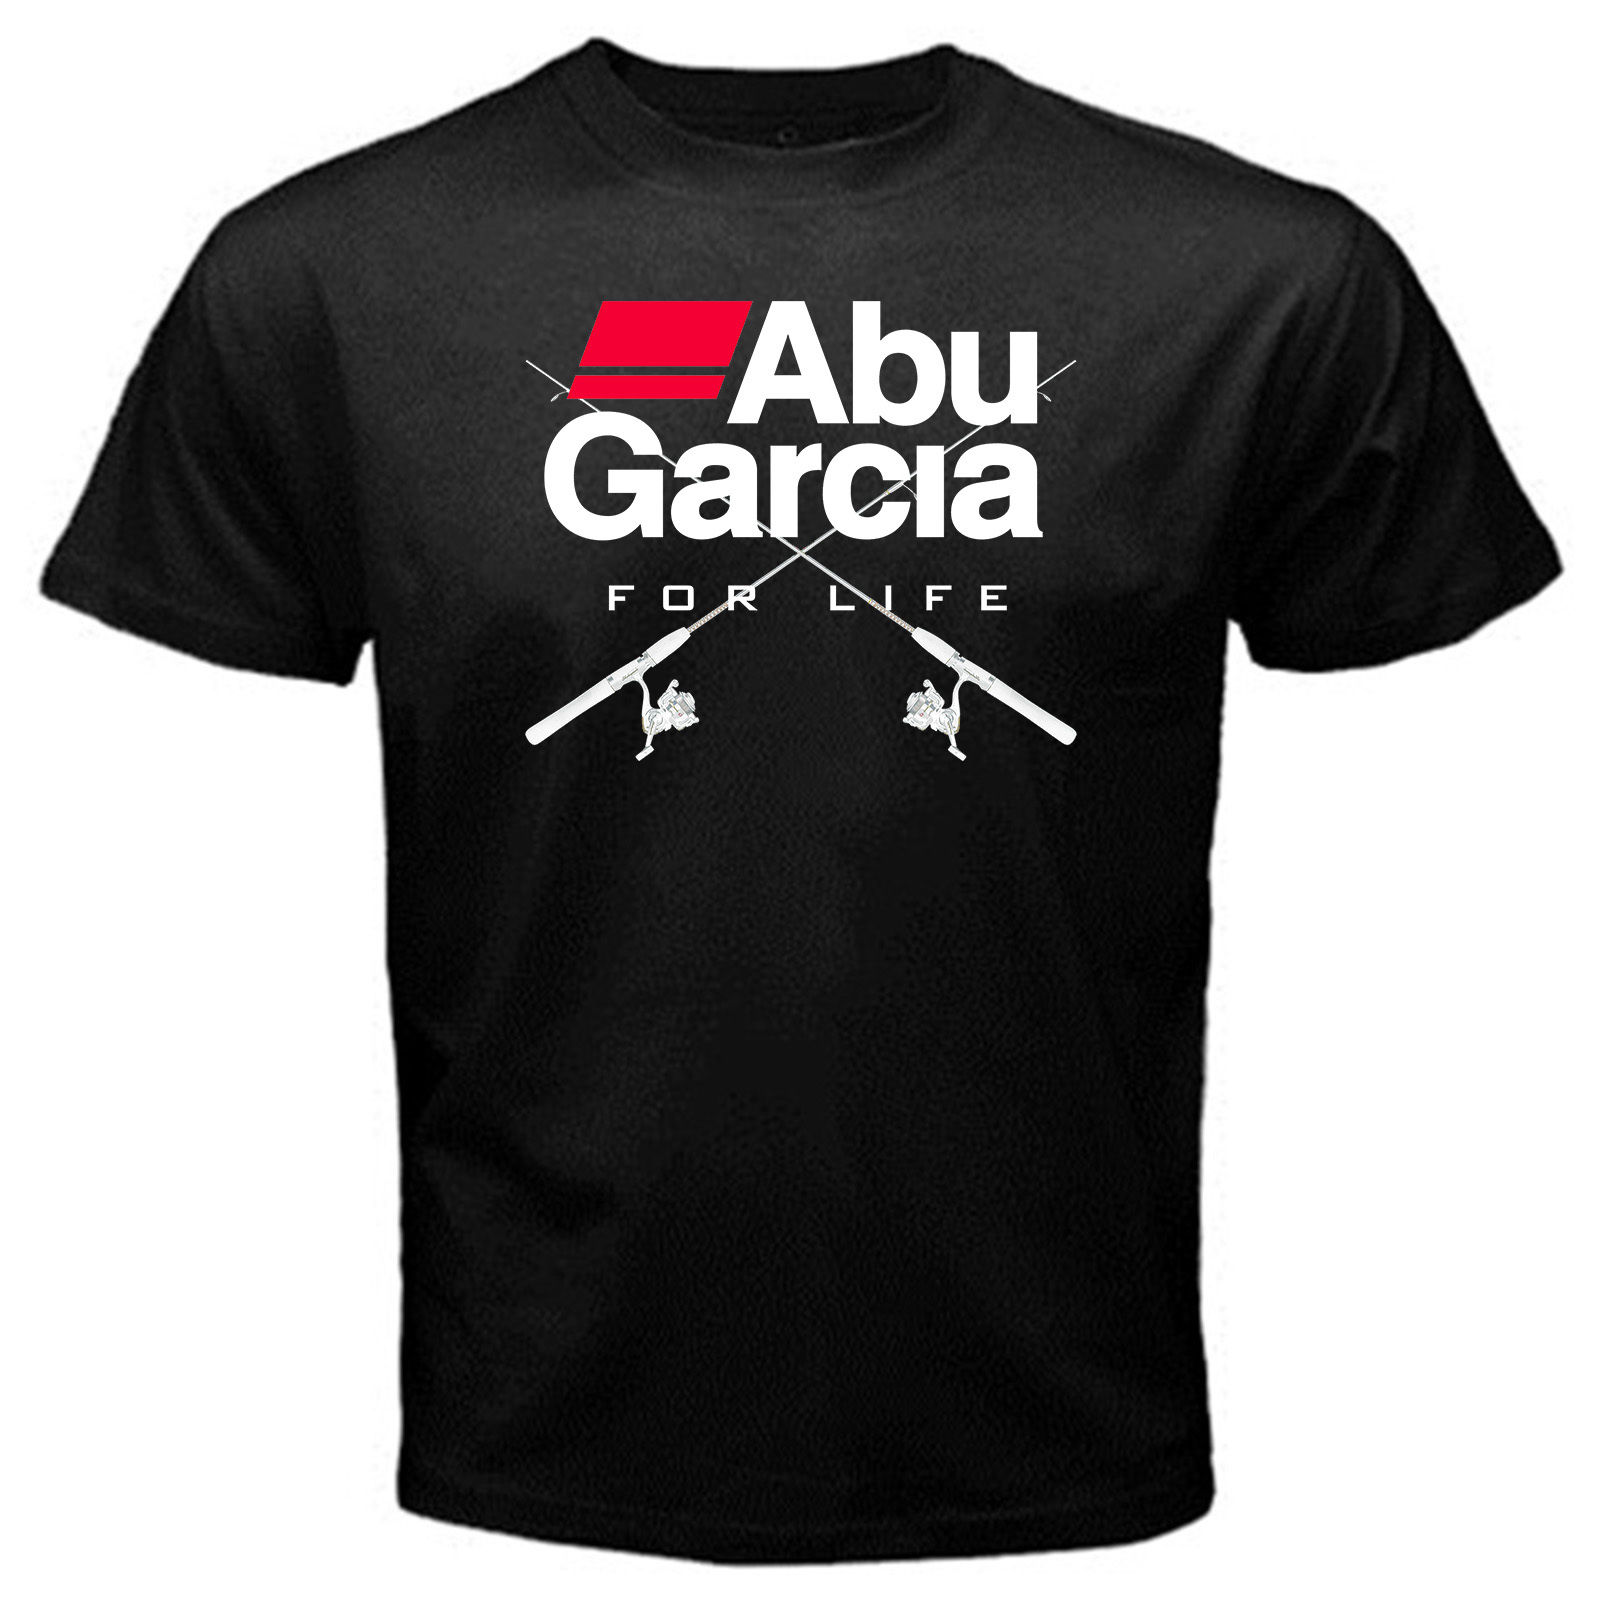 Abu garcia dufresne and redding fishinger galveston panama t shirt 2017 fashion short sleeve black adult t-shirt s-2xl-0